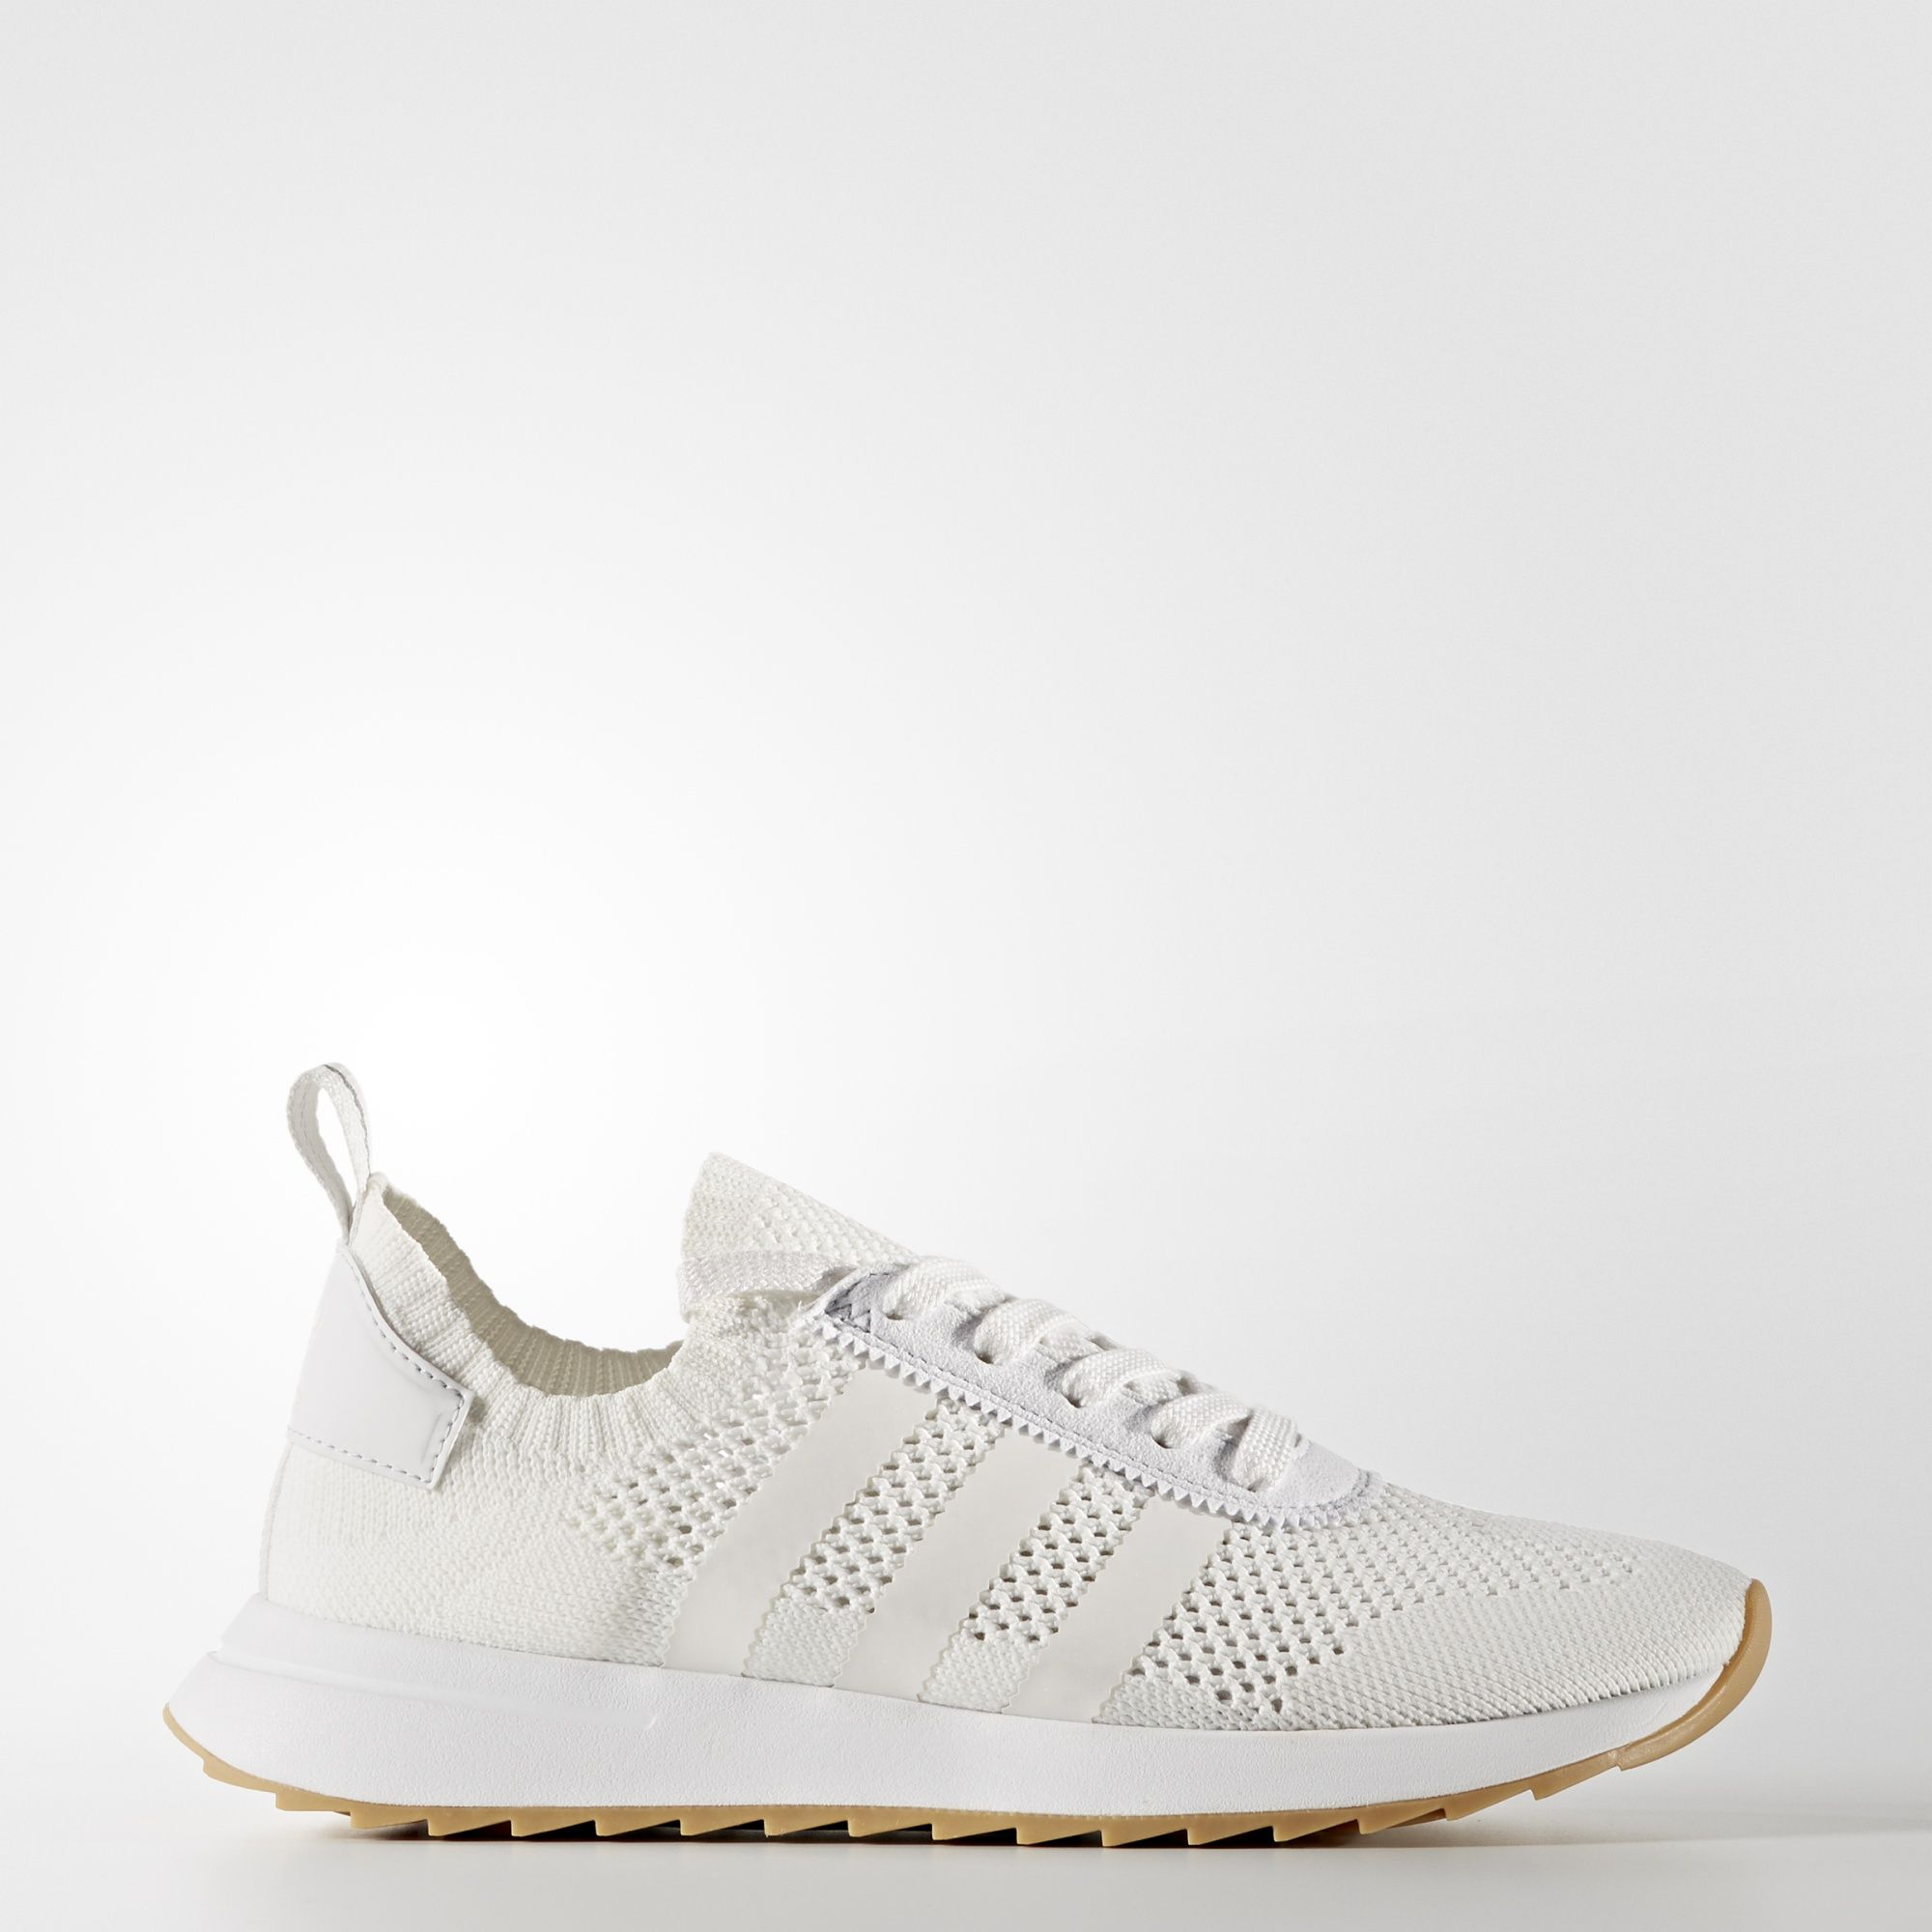 Voor Adidas Flashback Shoes Nursing White Primeknit School rTqwrES